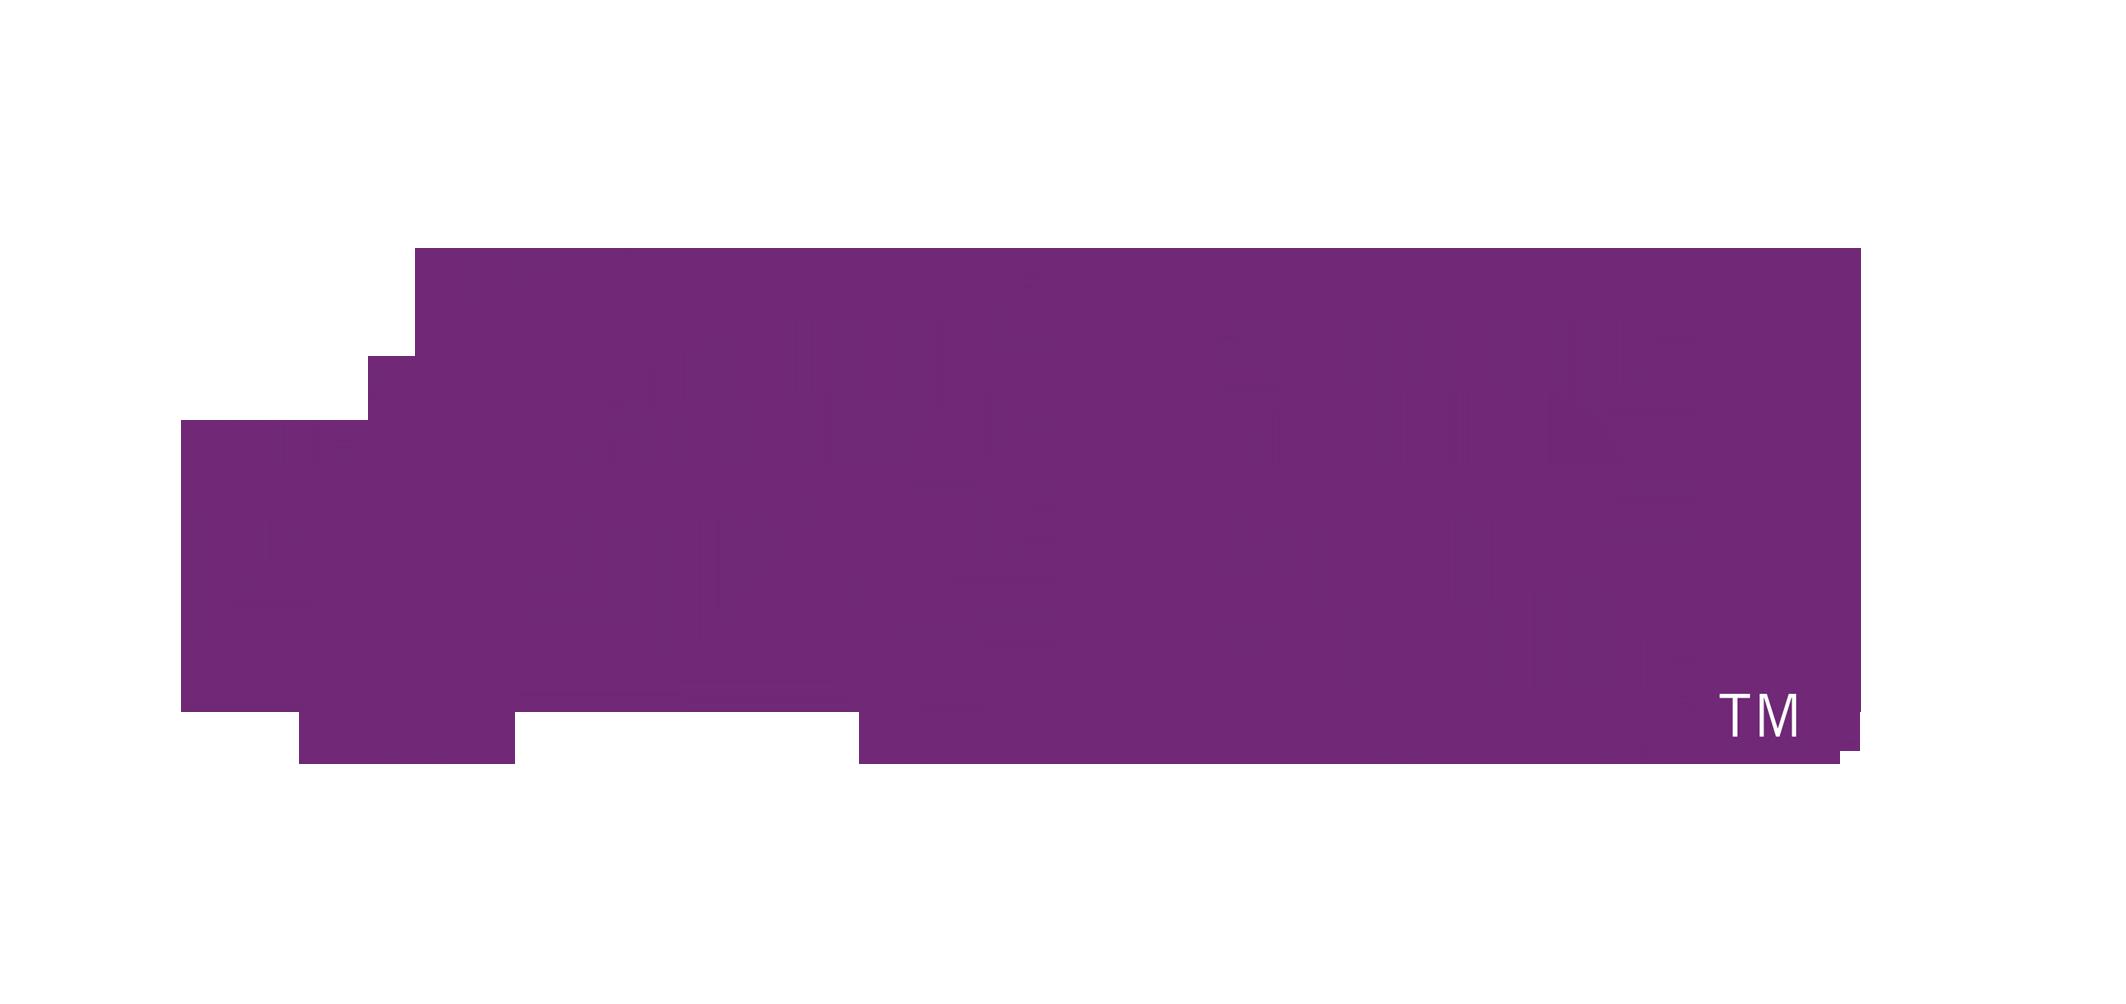 Equine solutions sharjah tour. Clipart ruler purple